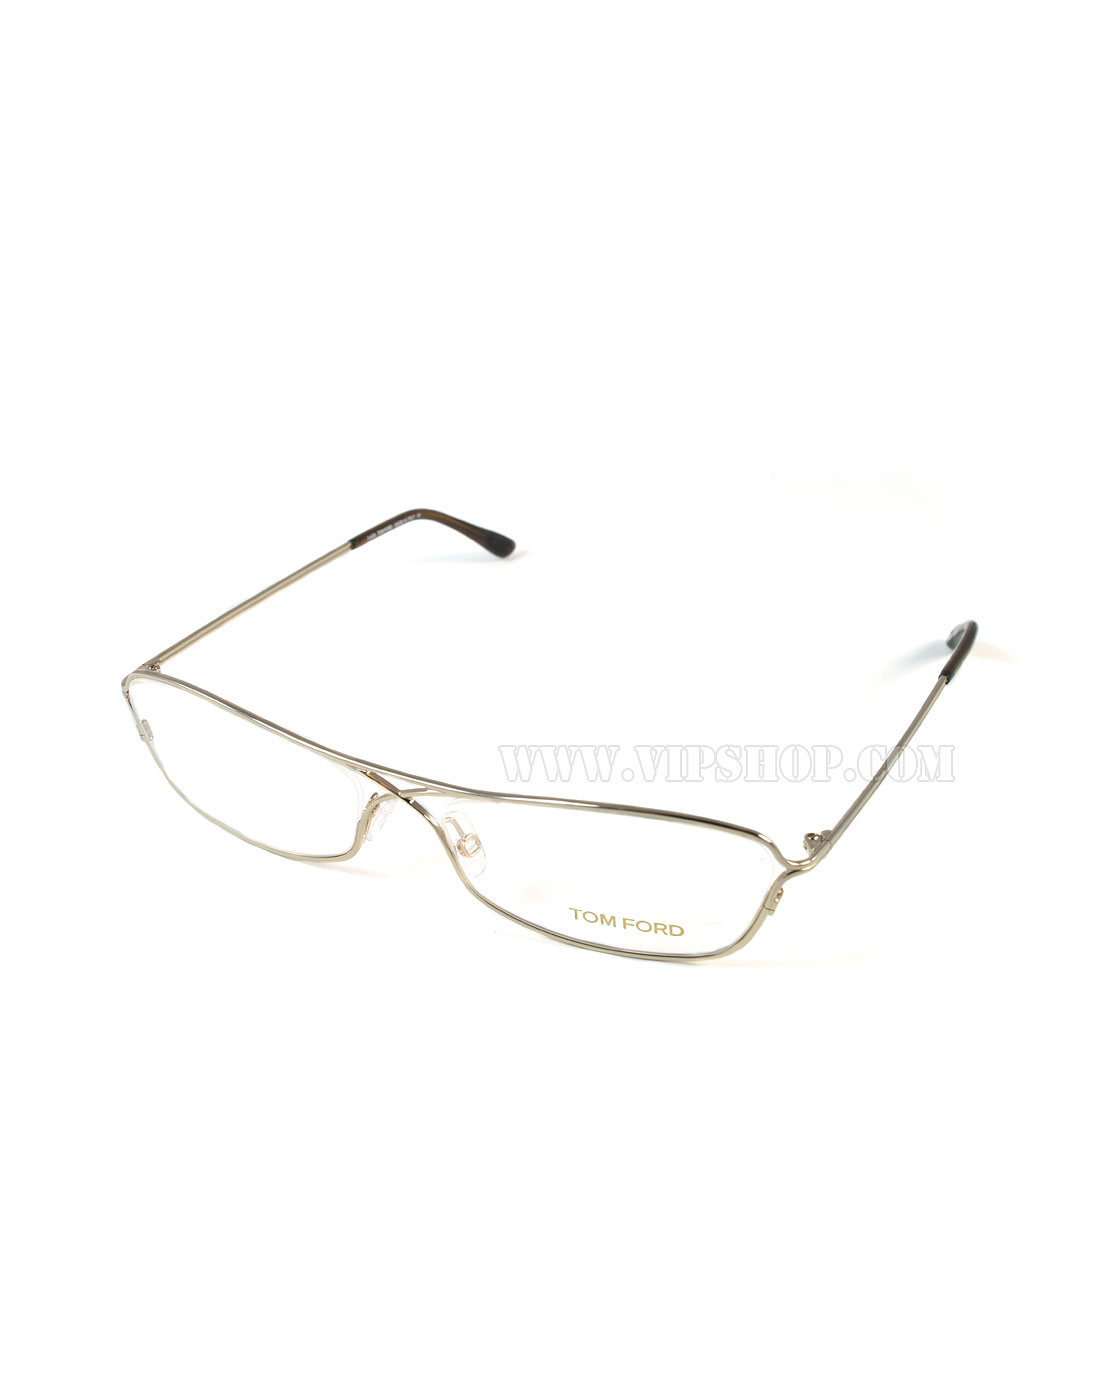 tom ford 女款轻盈金丝边框眼镜架